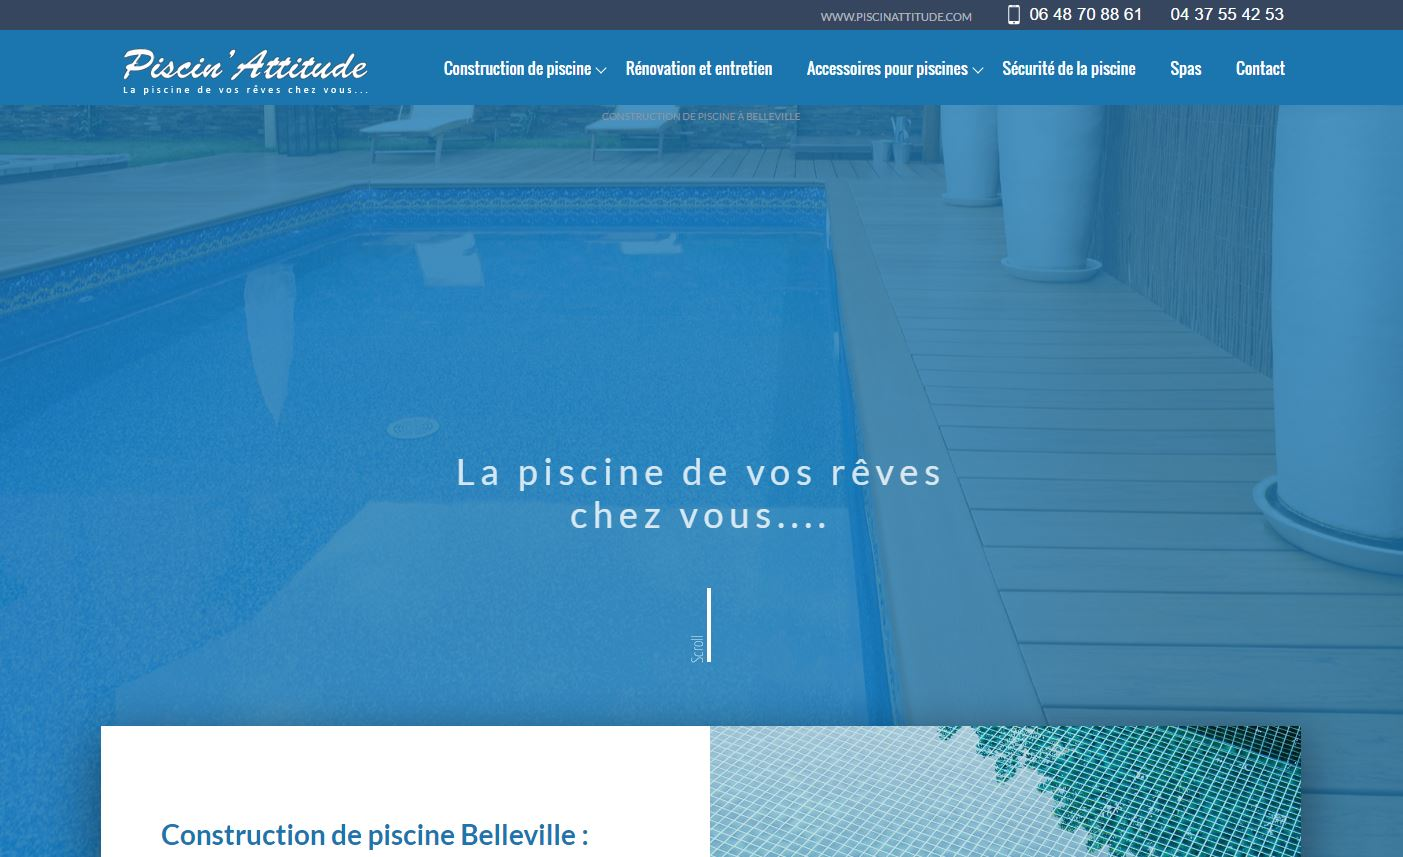 Pisciniste site internet mobile friendly